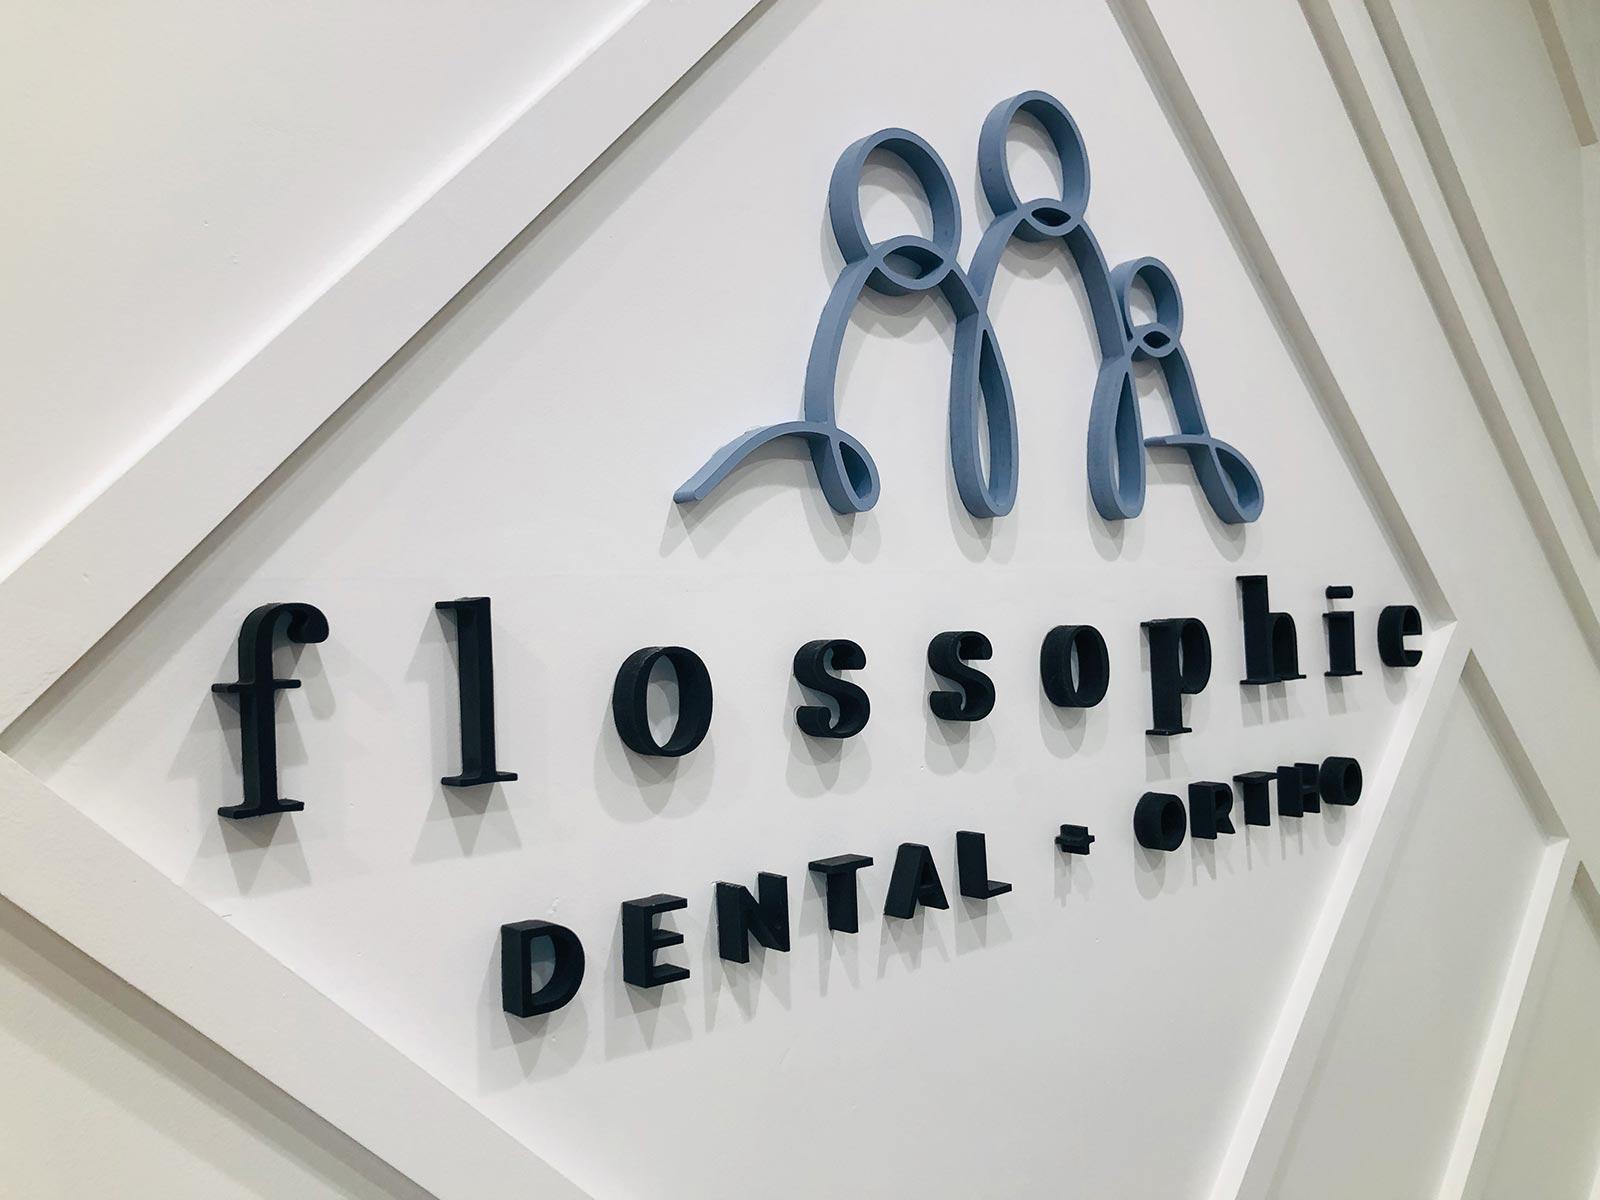 Flossophie Dental - Ortho 1